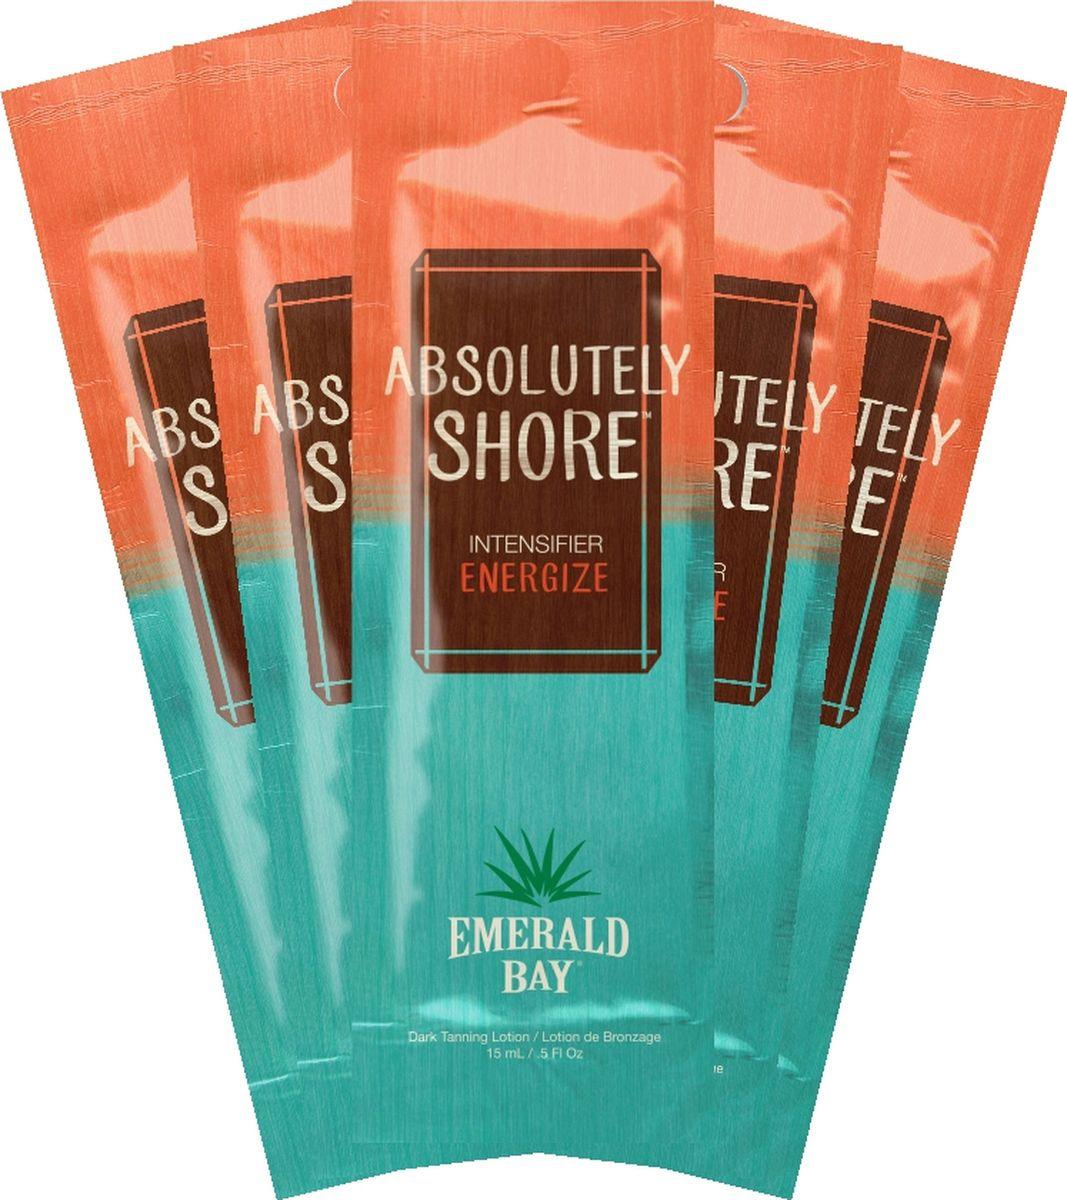 Крем для загара в солярии Emerald Bay Absolutely Shore, 15 мл х 5 шт крем для загара в солярии emerald bay choco latta love 15 мл х 5 шт